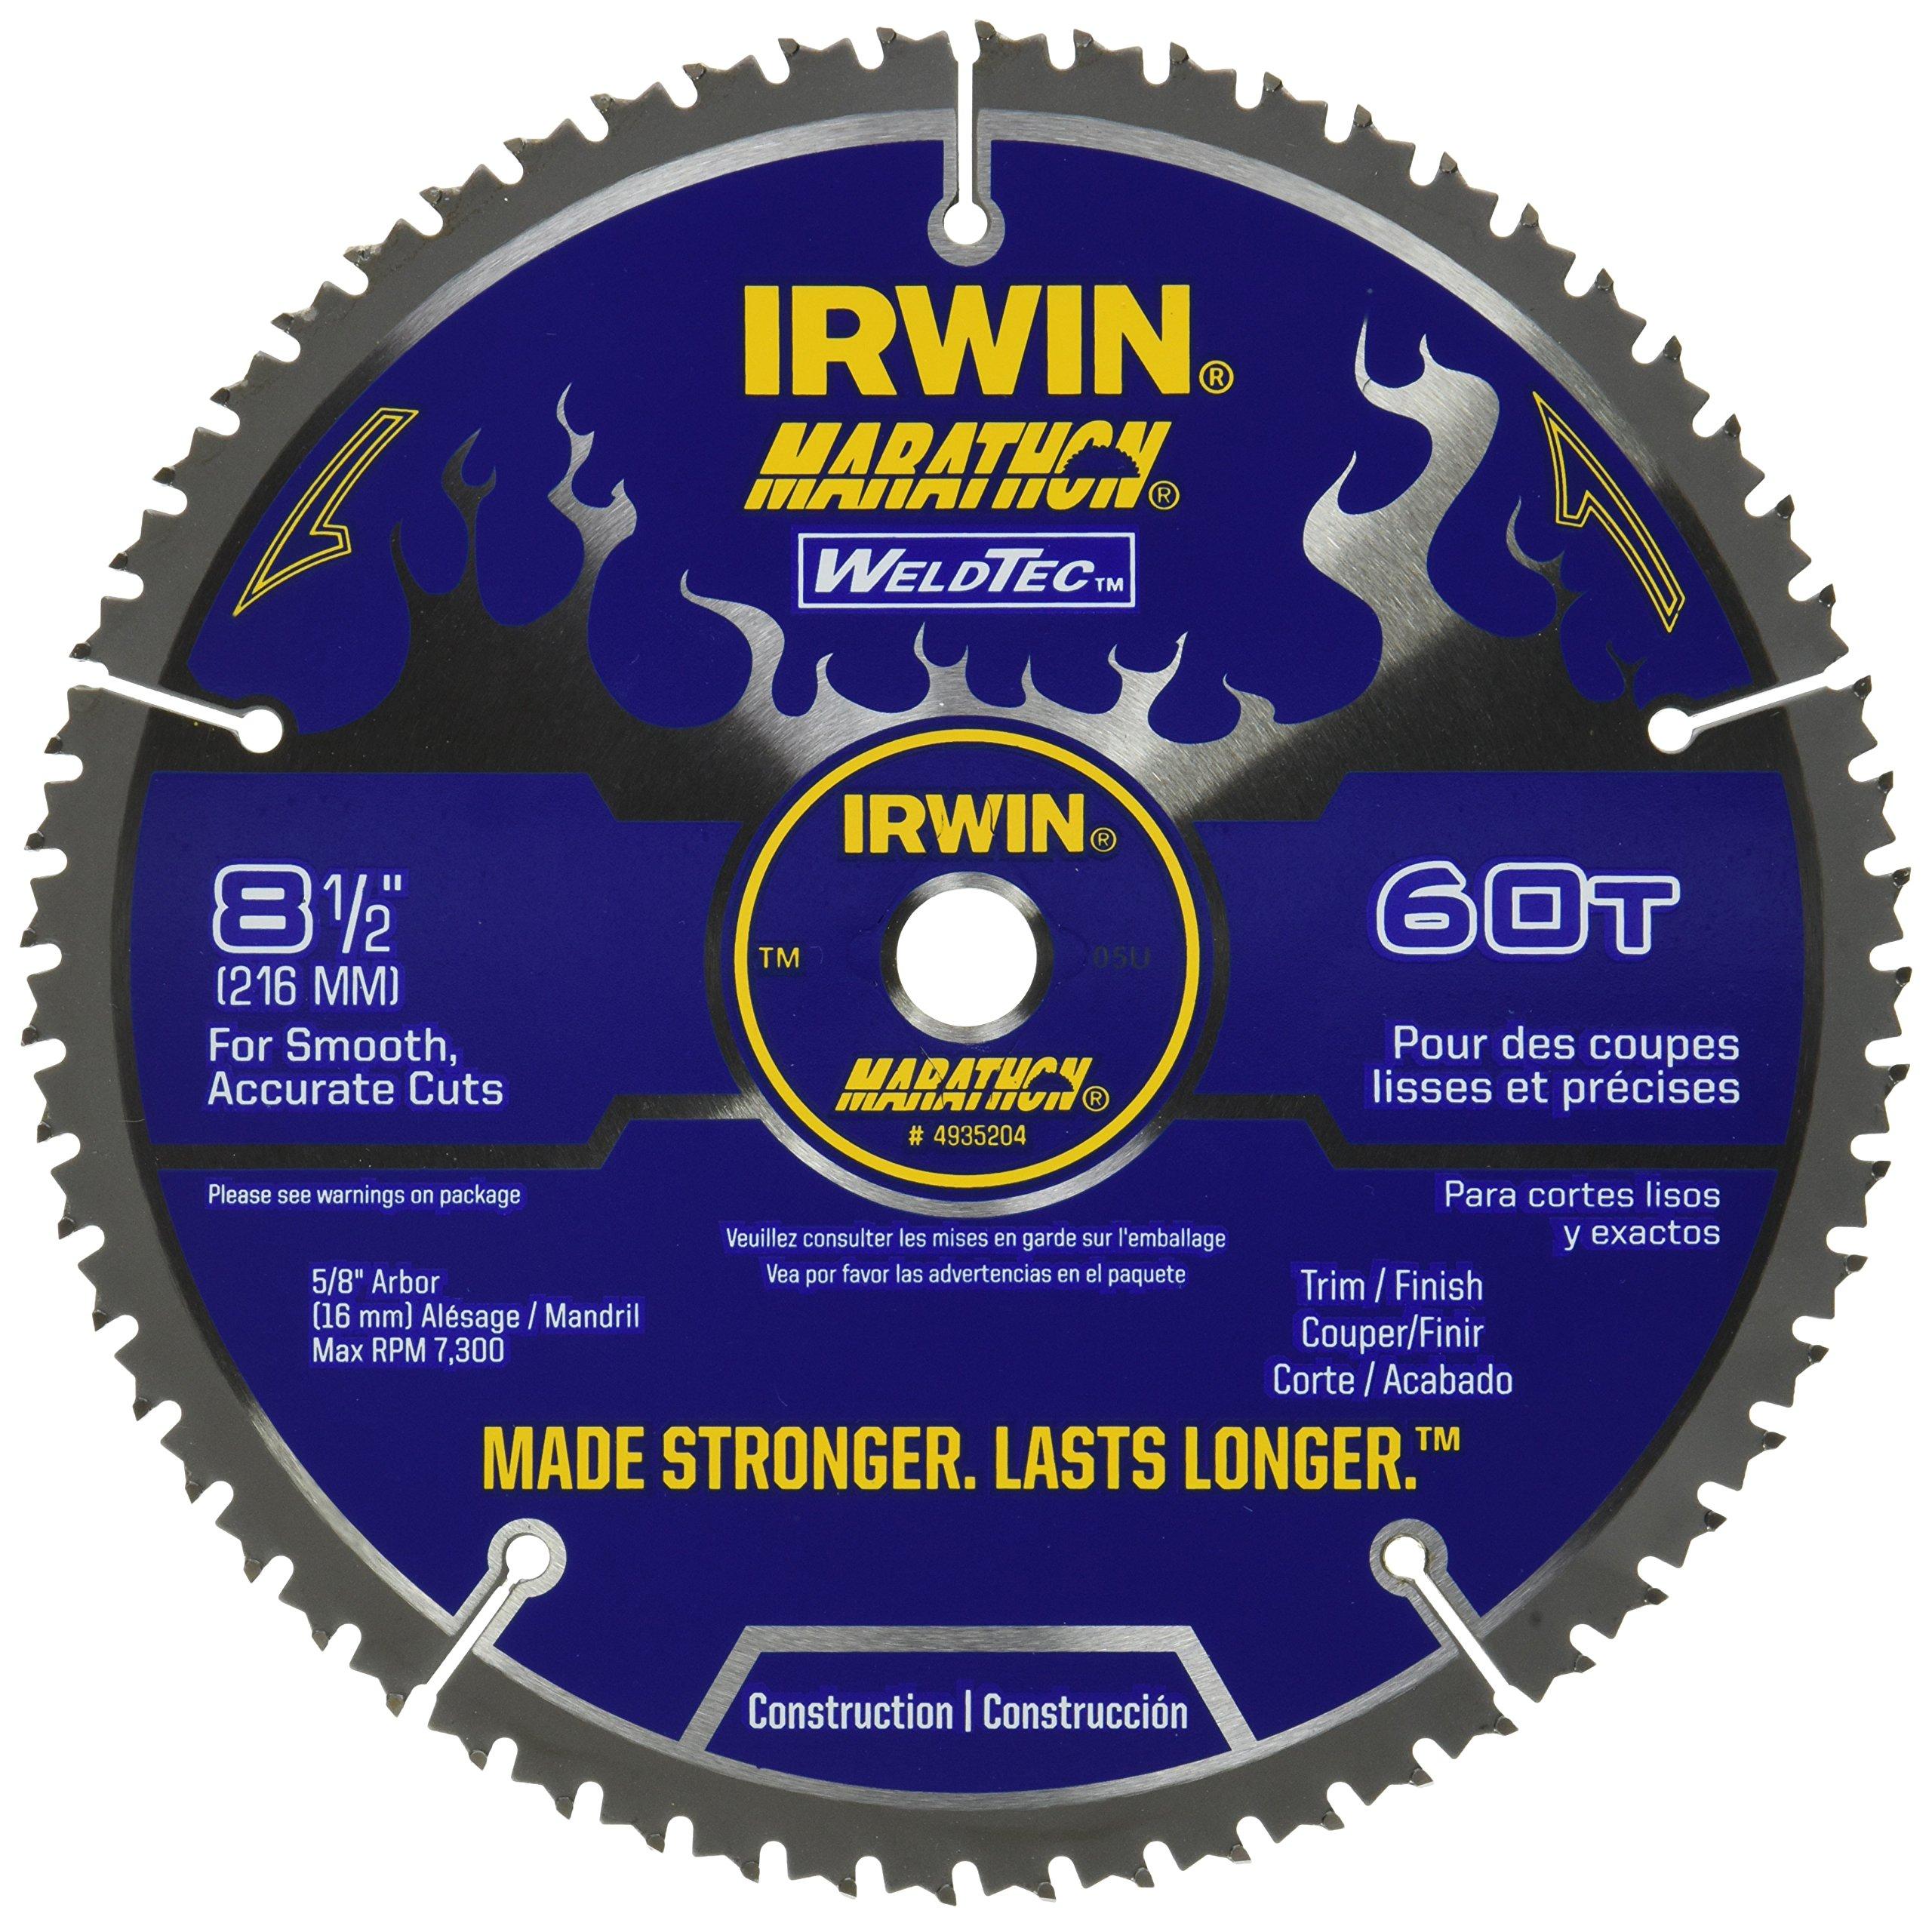 IRWIN Tools MARATHON WeldTec Circular Saw Blade, 8-1/2-inch, 60T (4935204) by IRWIN